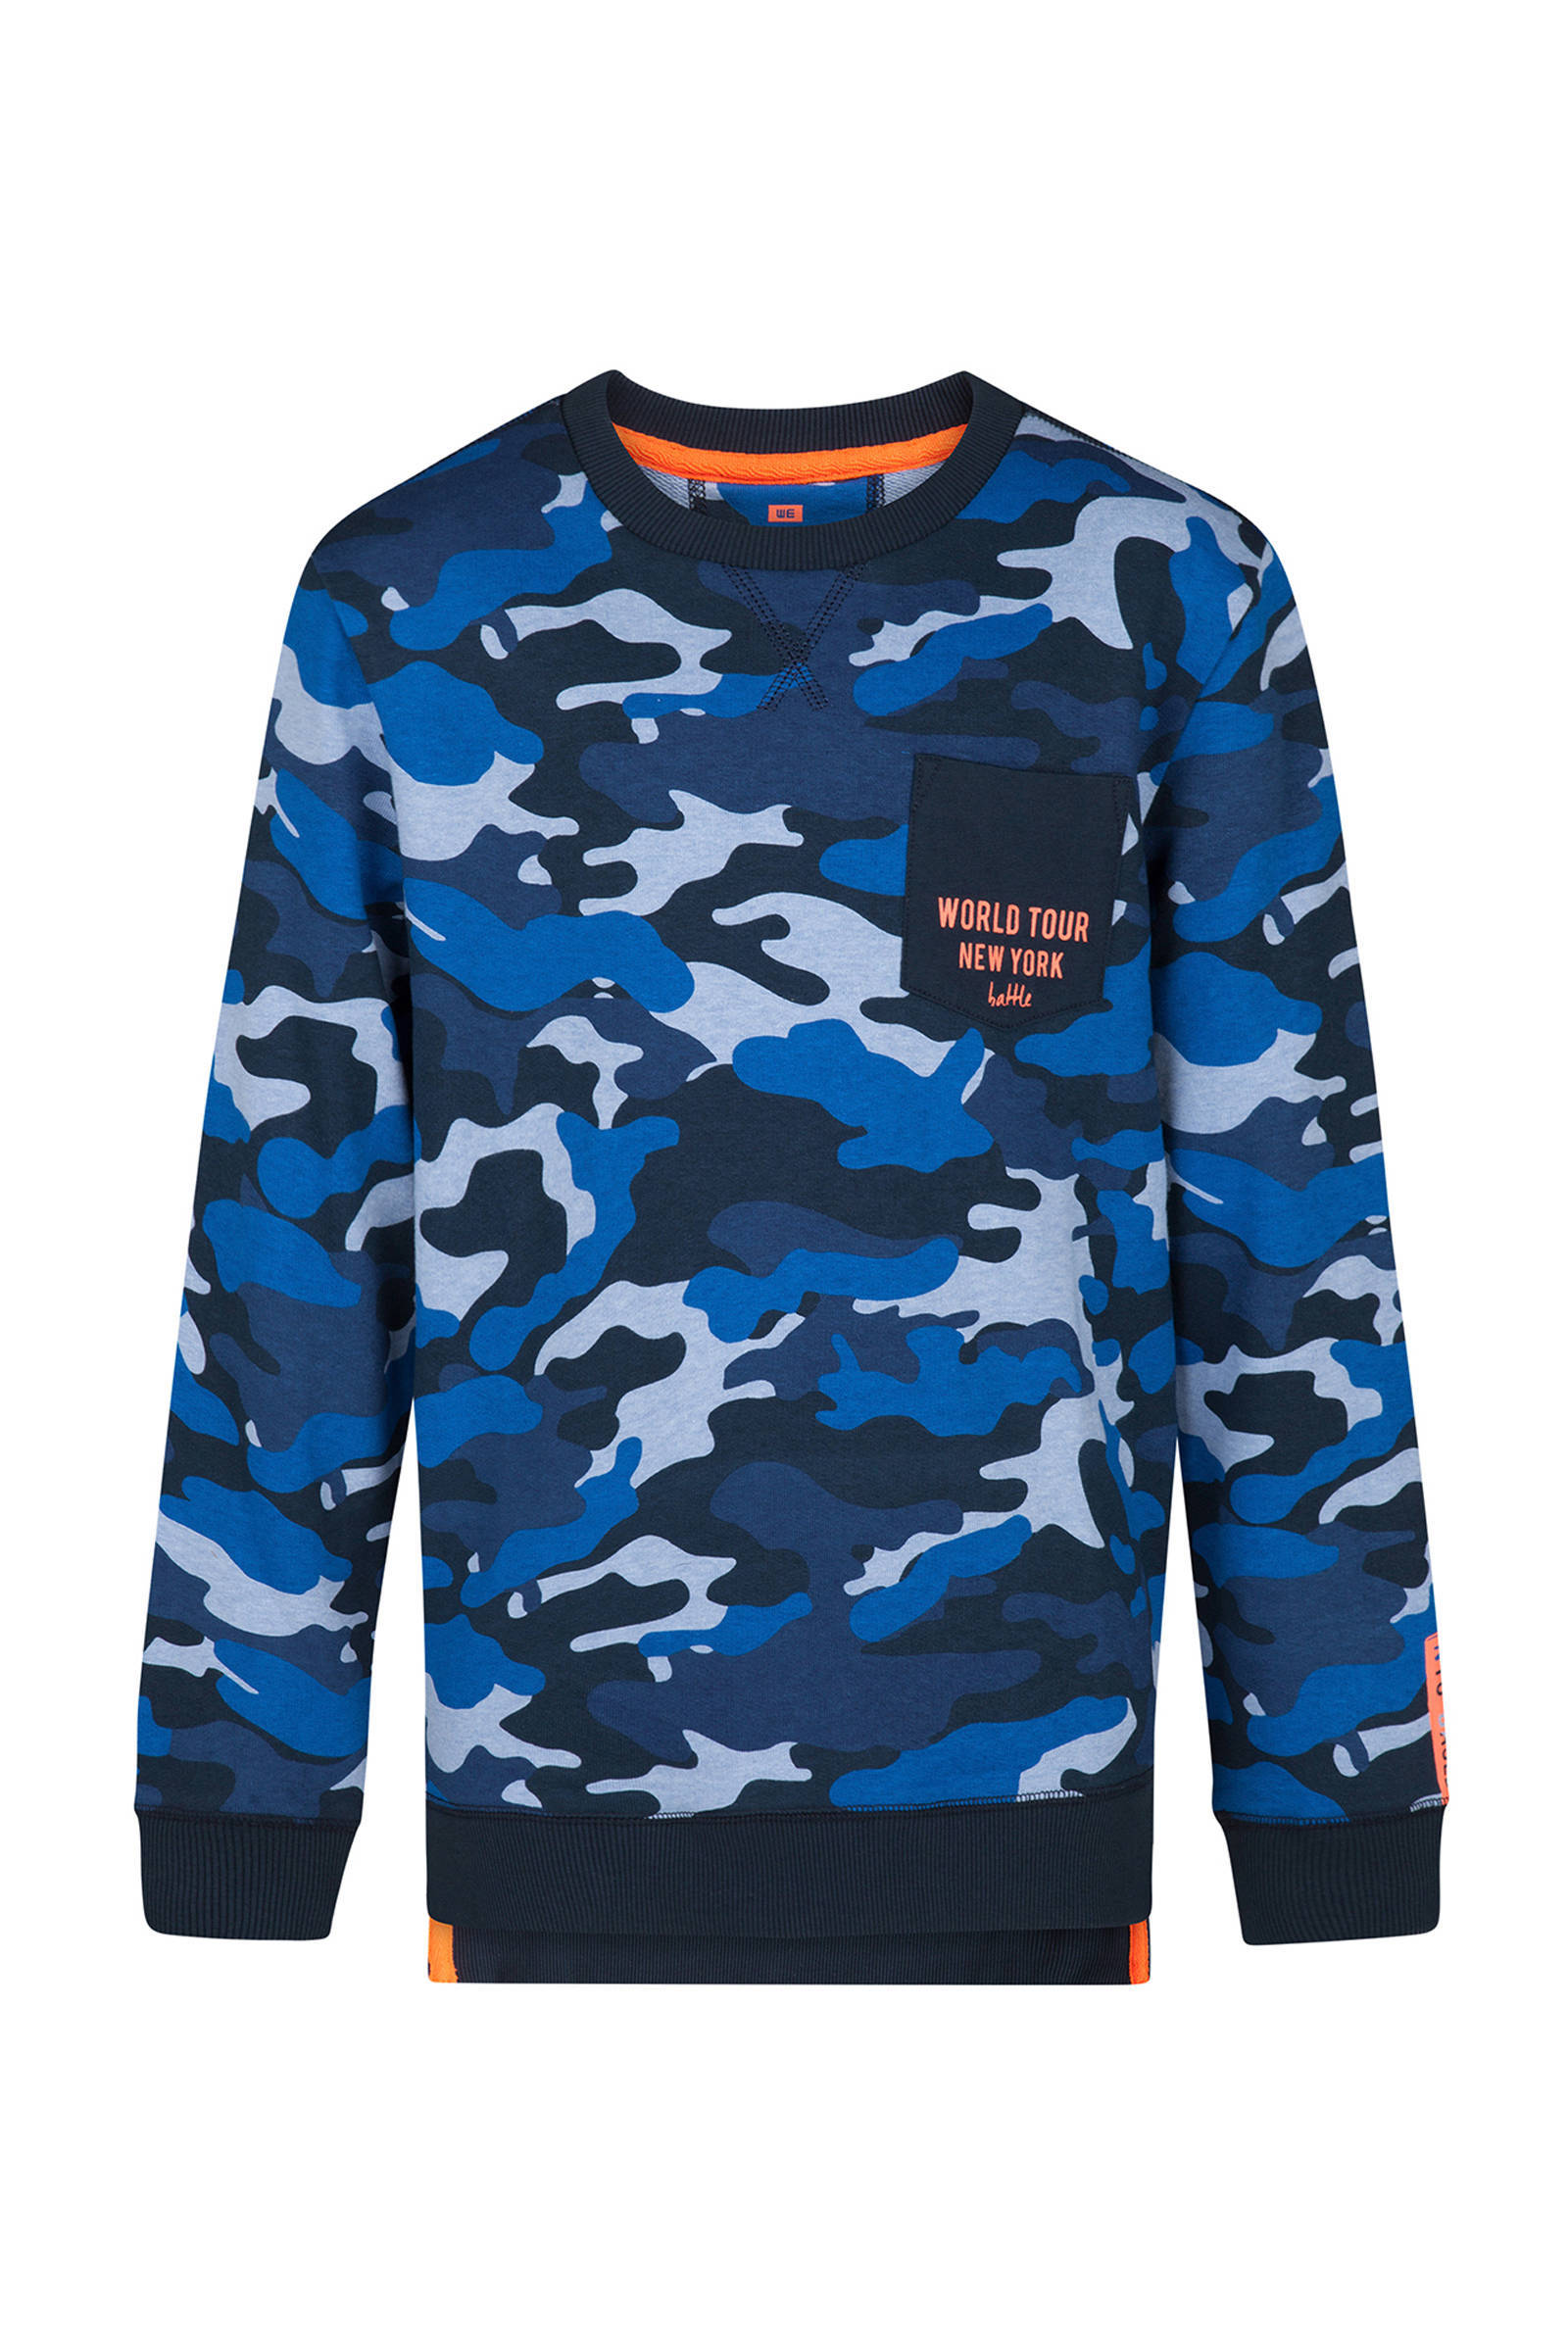 DAMES ARMY PRINT SWEATER | 79317177 WE Fashion